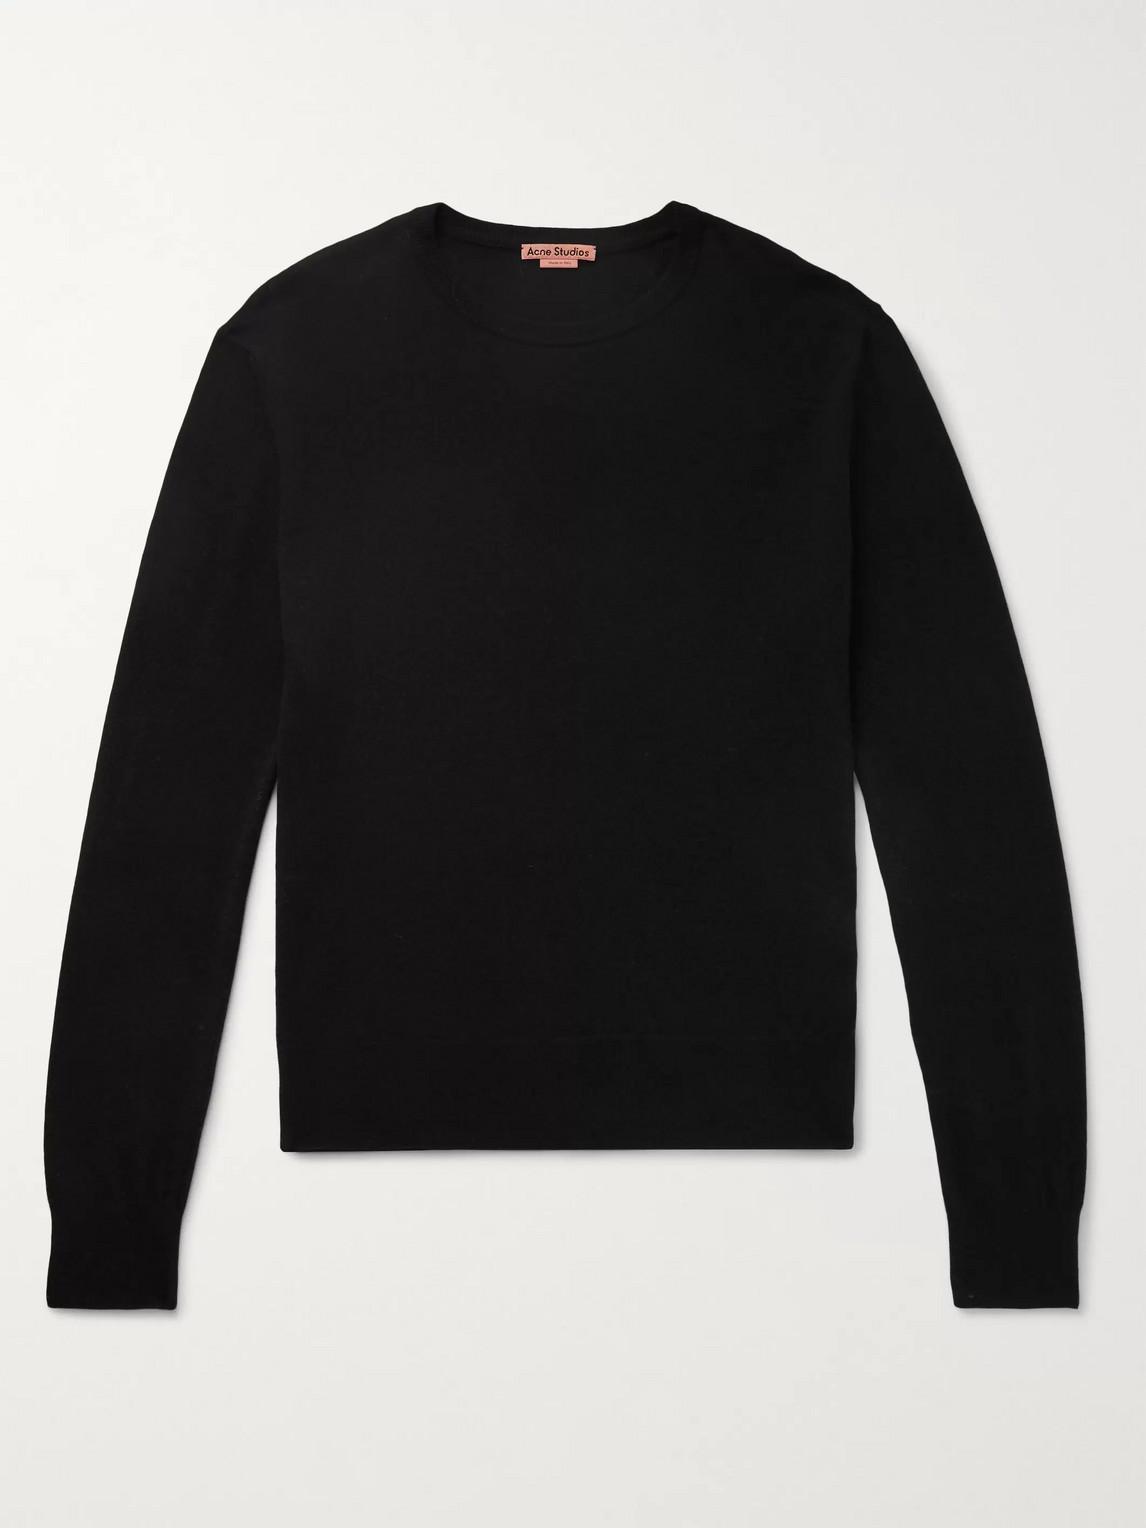 acne studios - wool-blend sweater - men - black